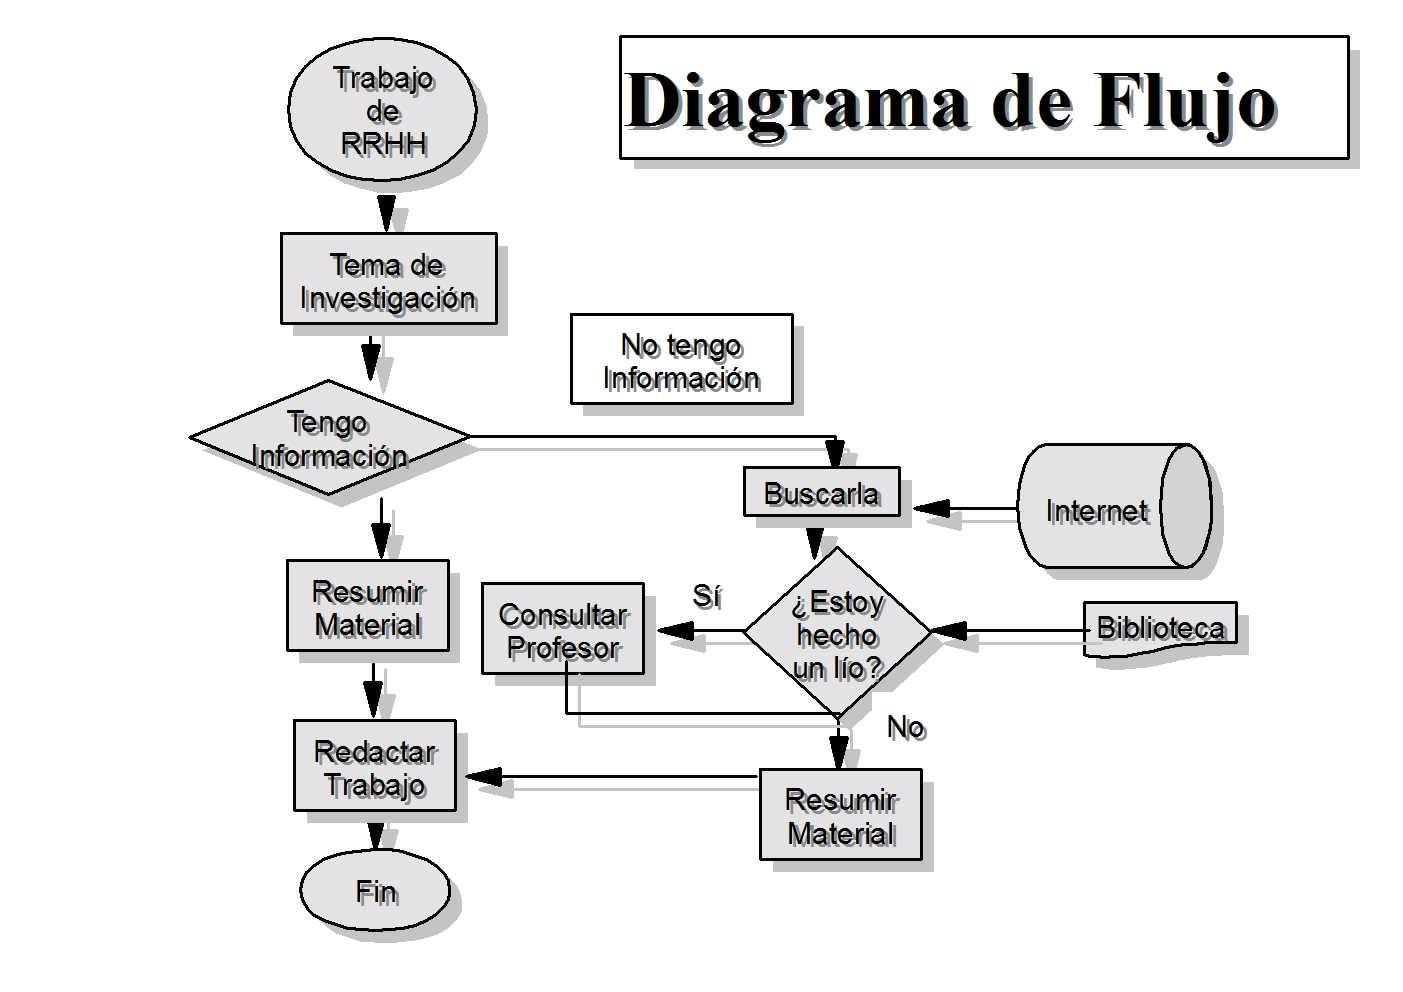 Tgs diagrama de flujo tgs ccuart Choice Image